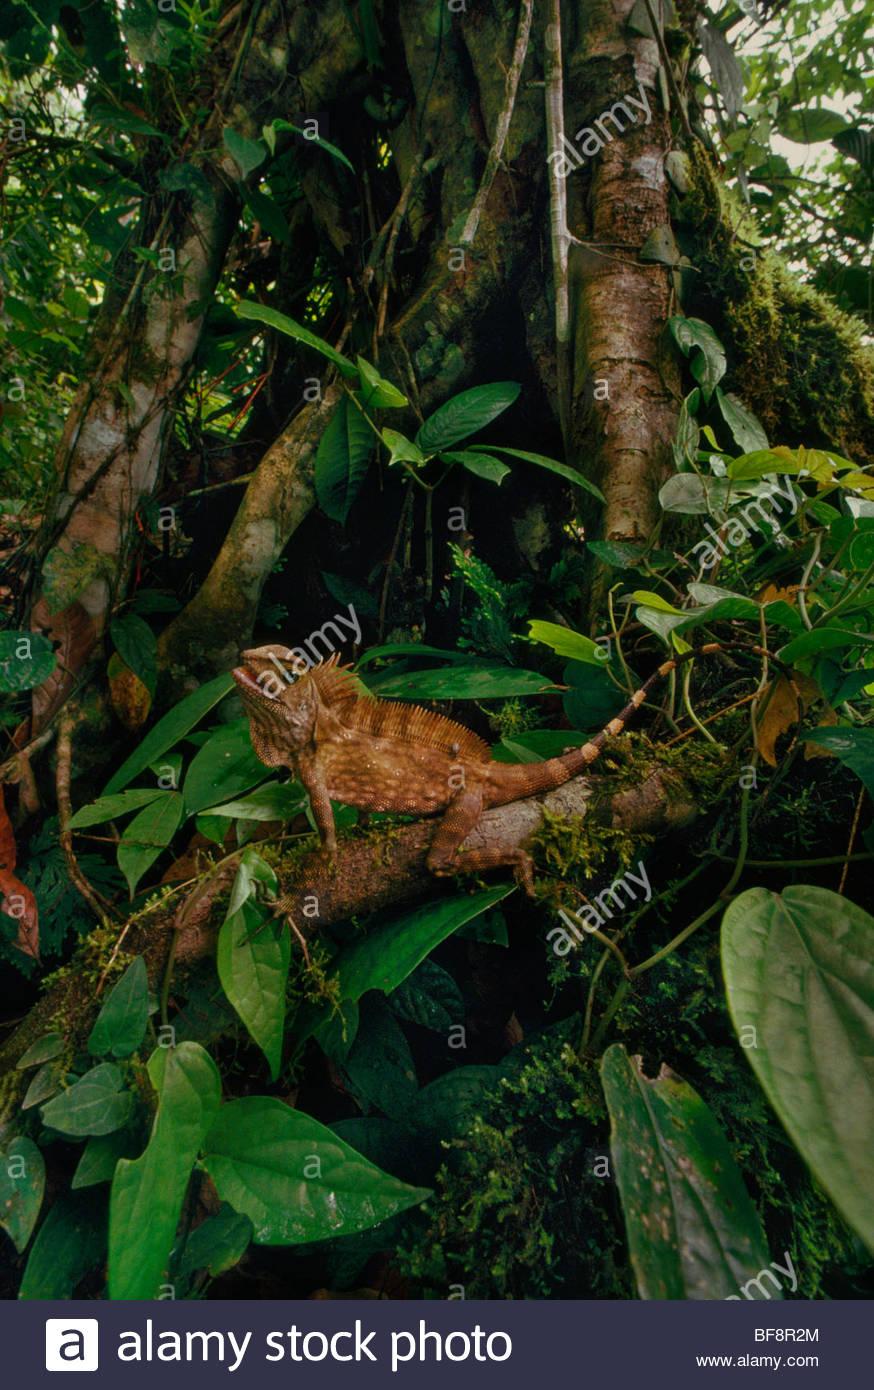 Bornean crested lizard, Gonocephalus grandis, Sabah, Borneo - Stock Image